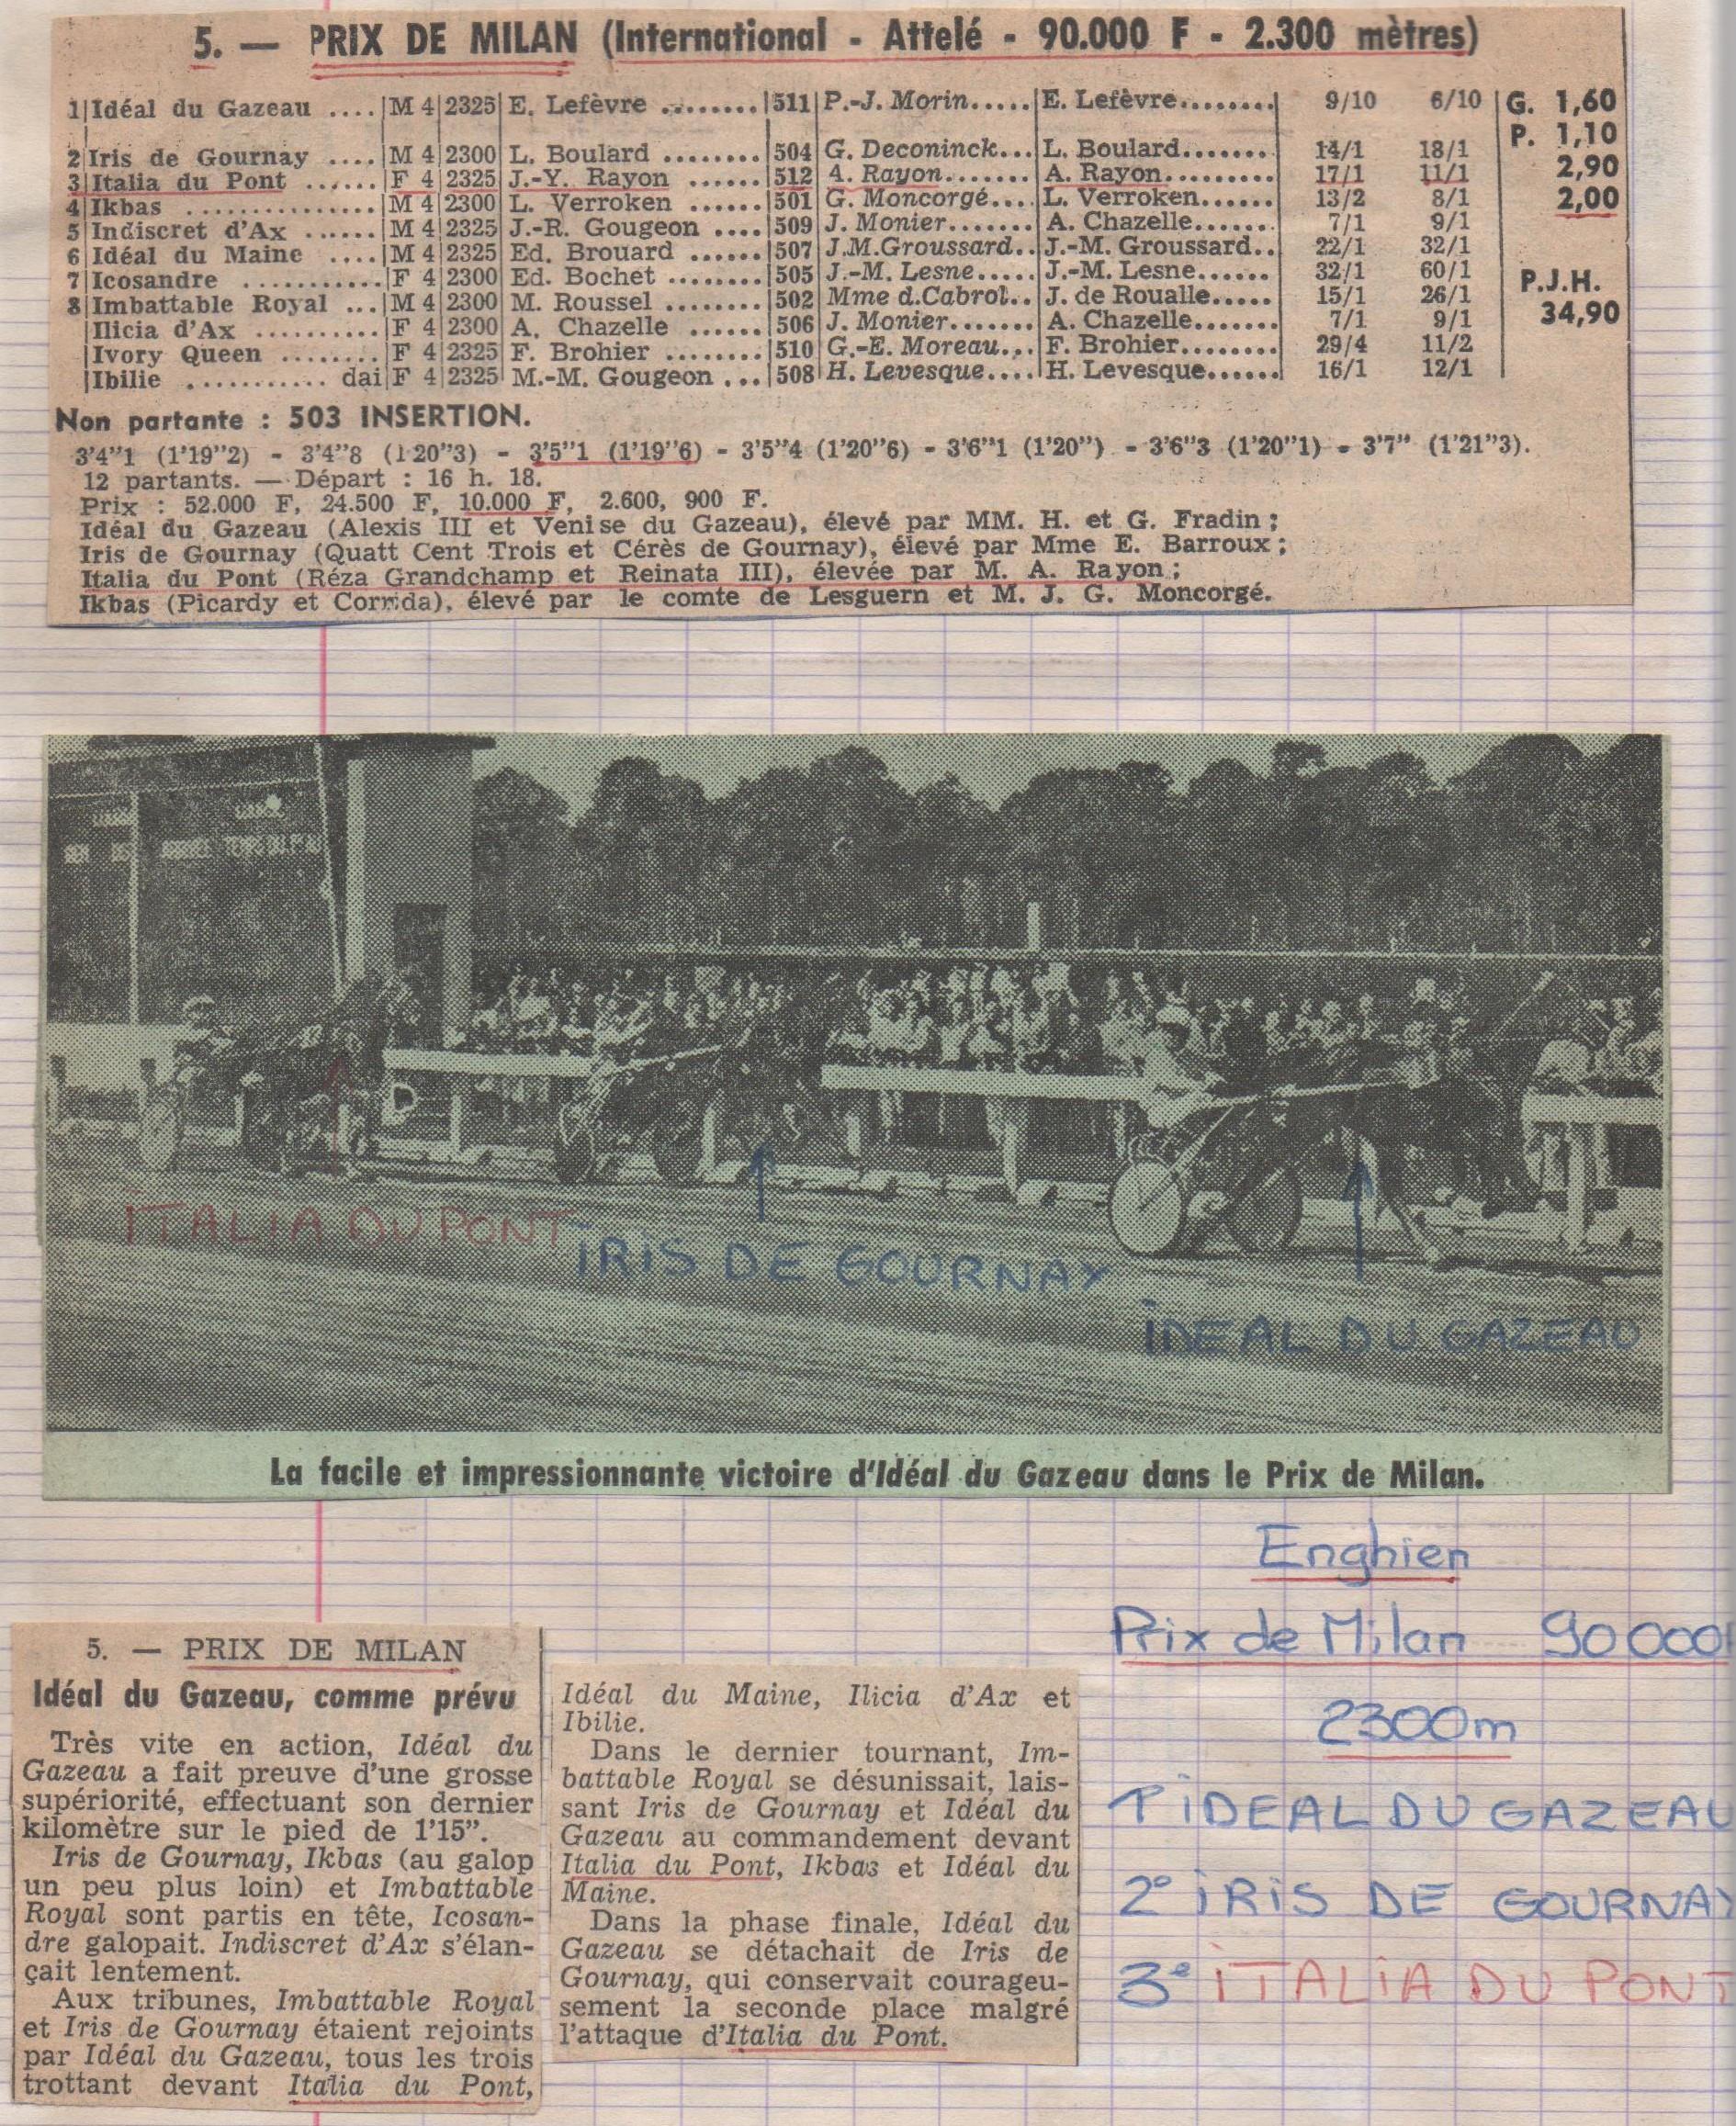 1978 08 19 Italia du Pont Prix de Milan